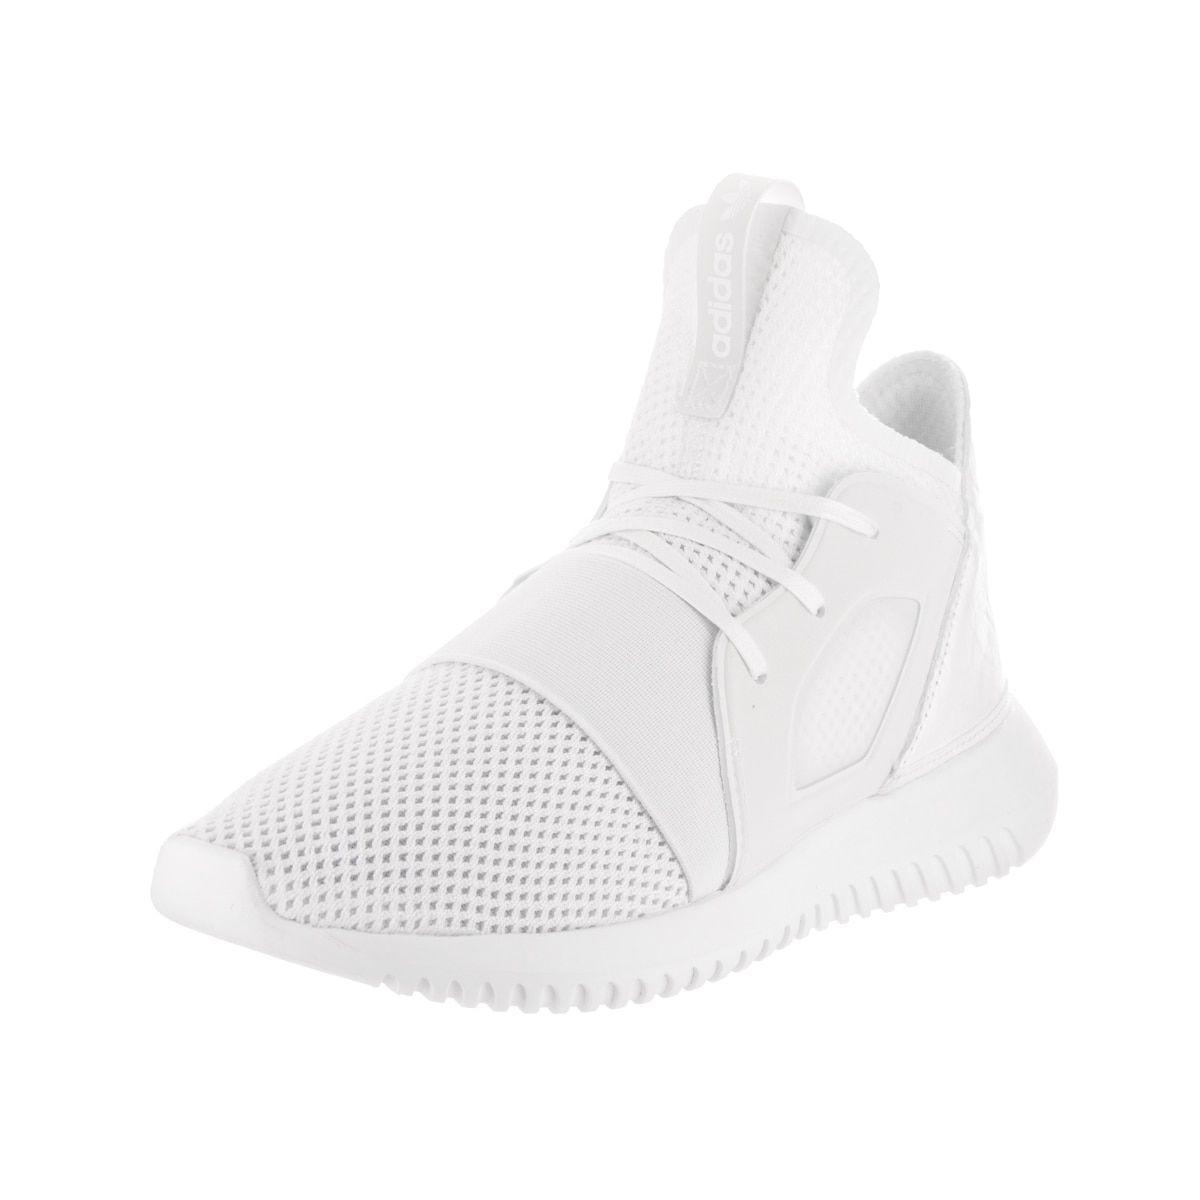 adidas donne tubulare ribelle w originali scarpa scarpe casual